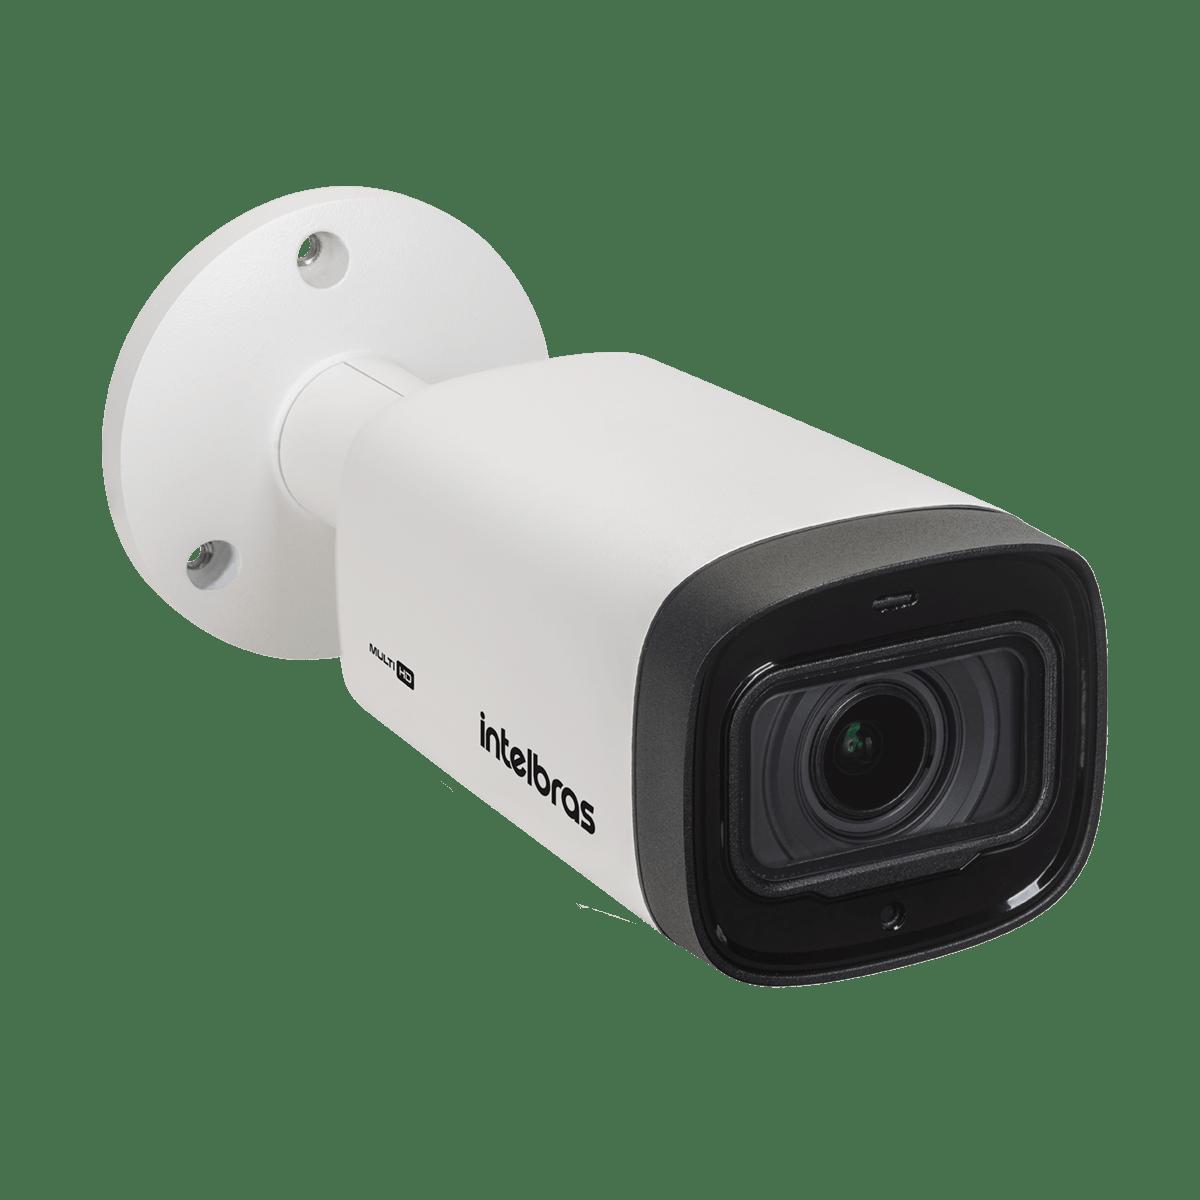 Câmera Intelbras Bullet VHD 3140 VF G6 (1.0MP   720p   2.7mm~13.5mm   Metal)   - CFTV Clube   Brasil